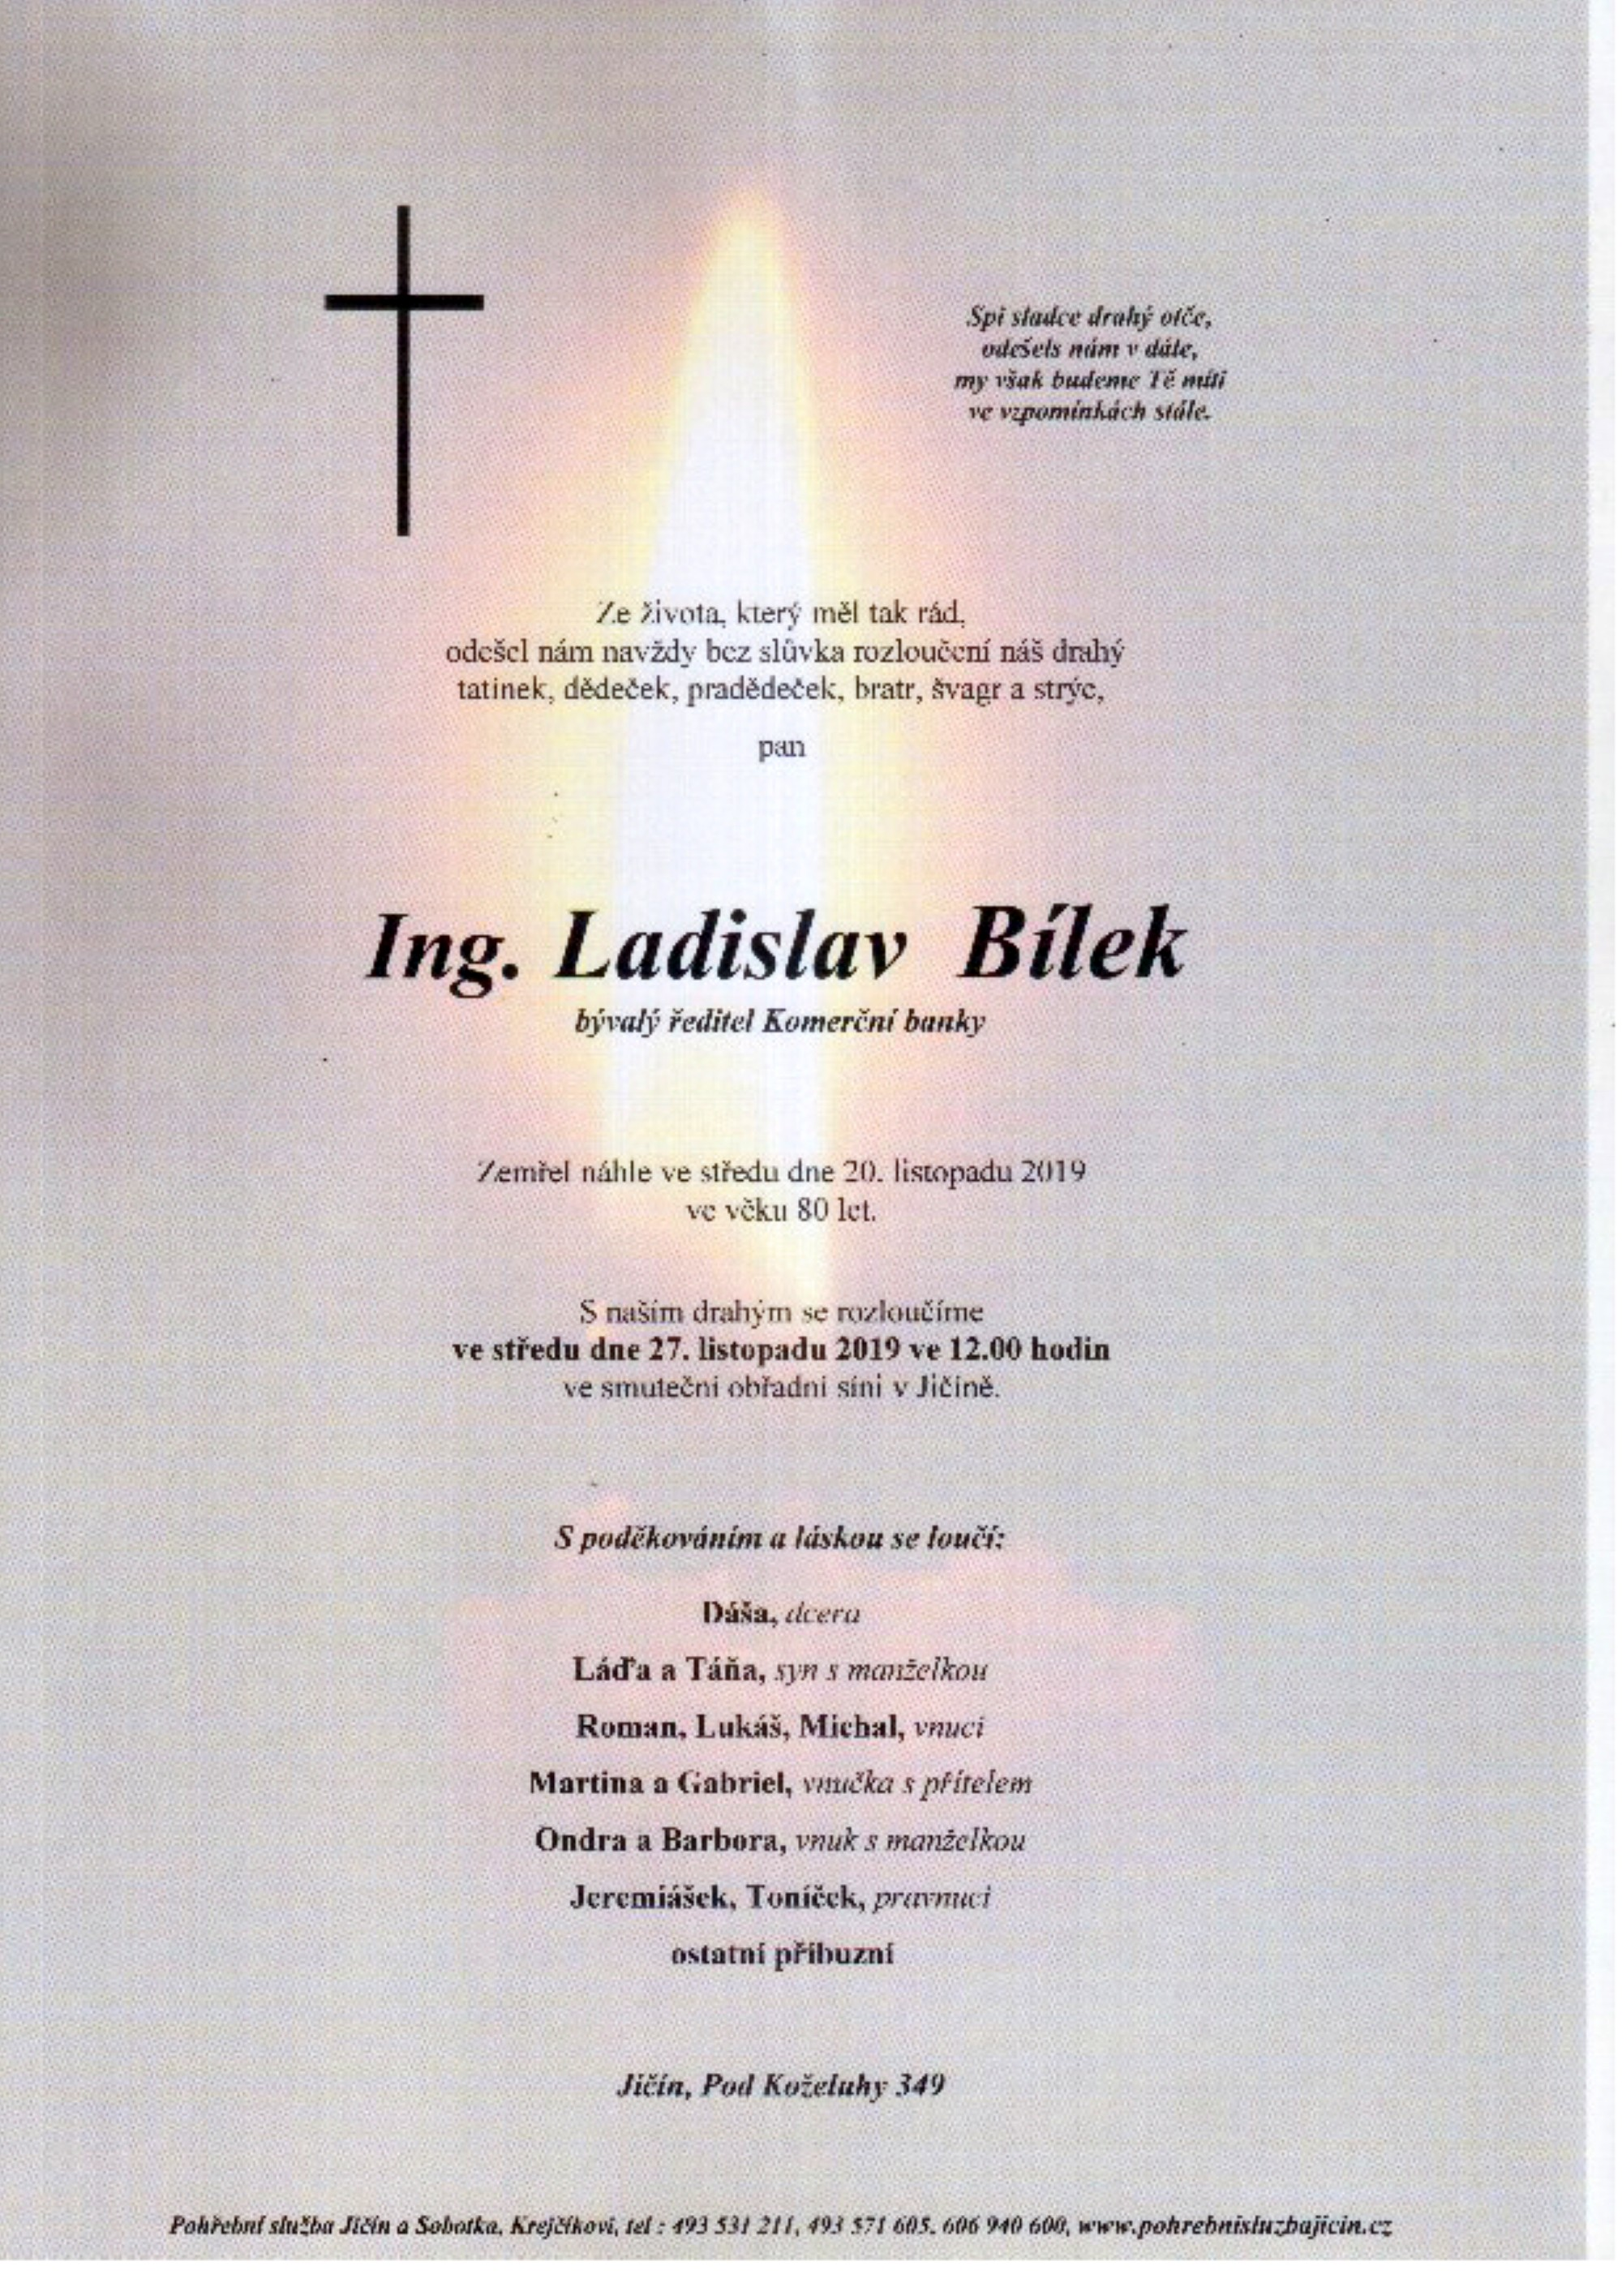 Ing. Ladislav Bílek